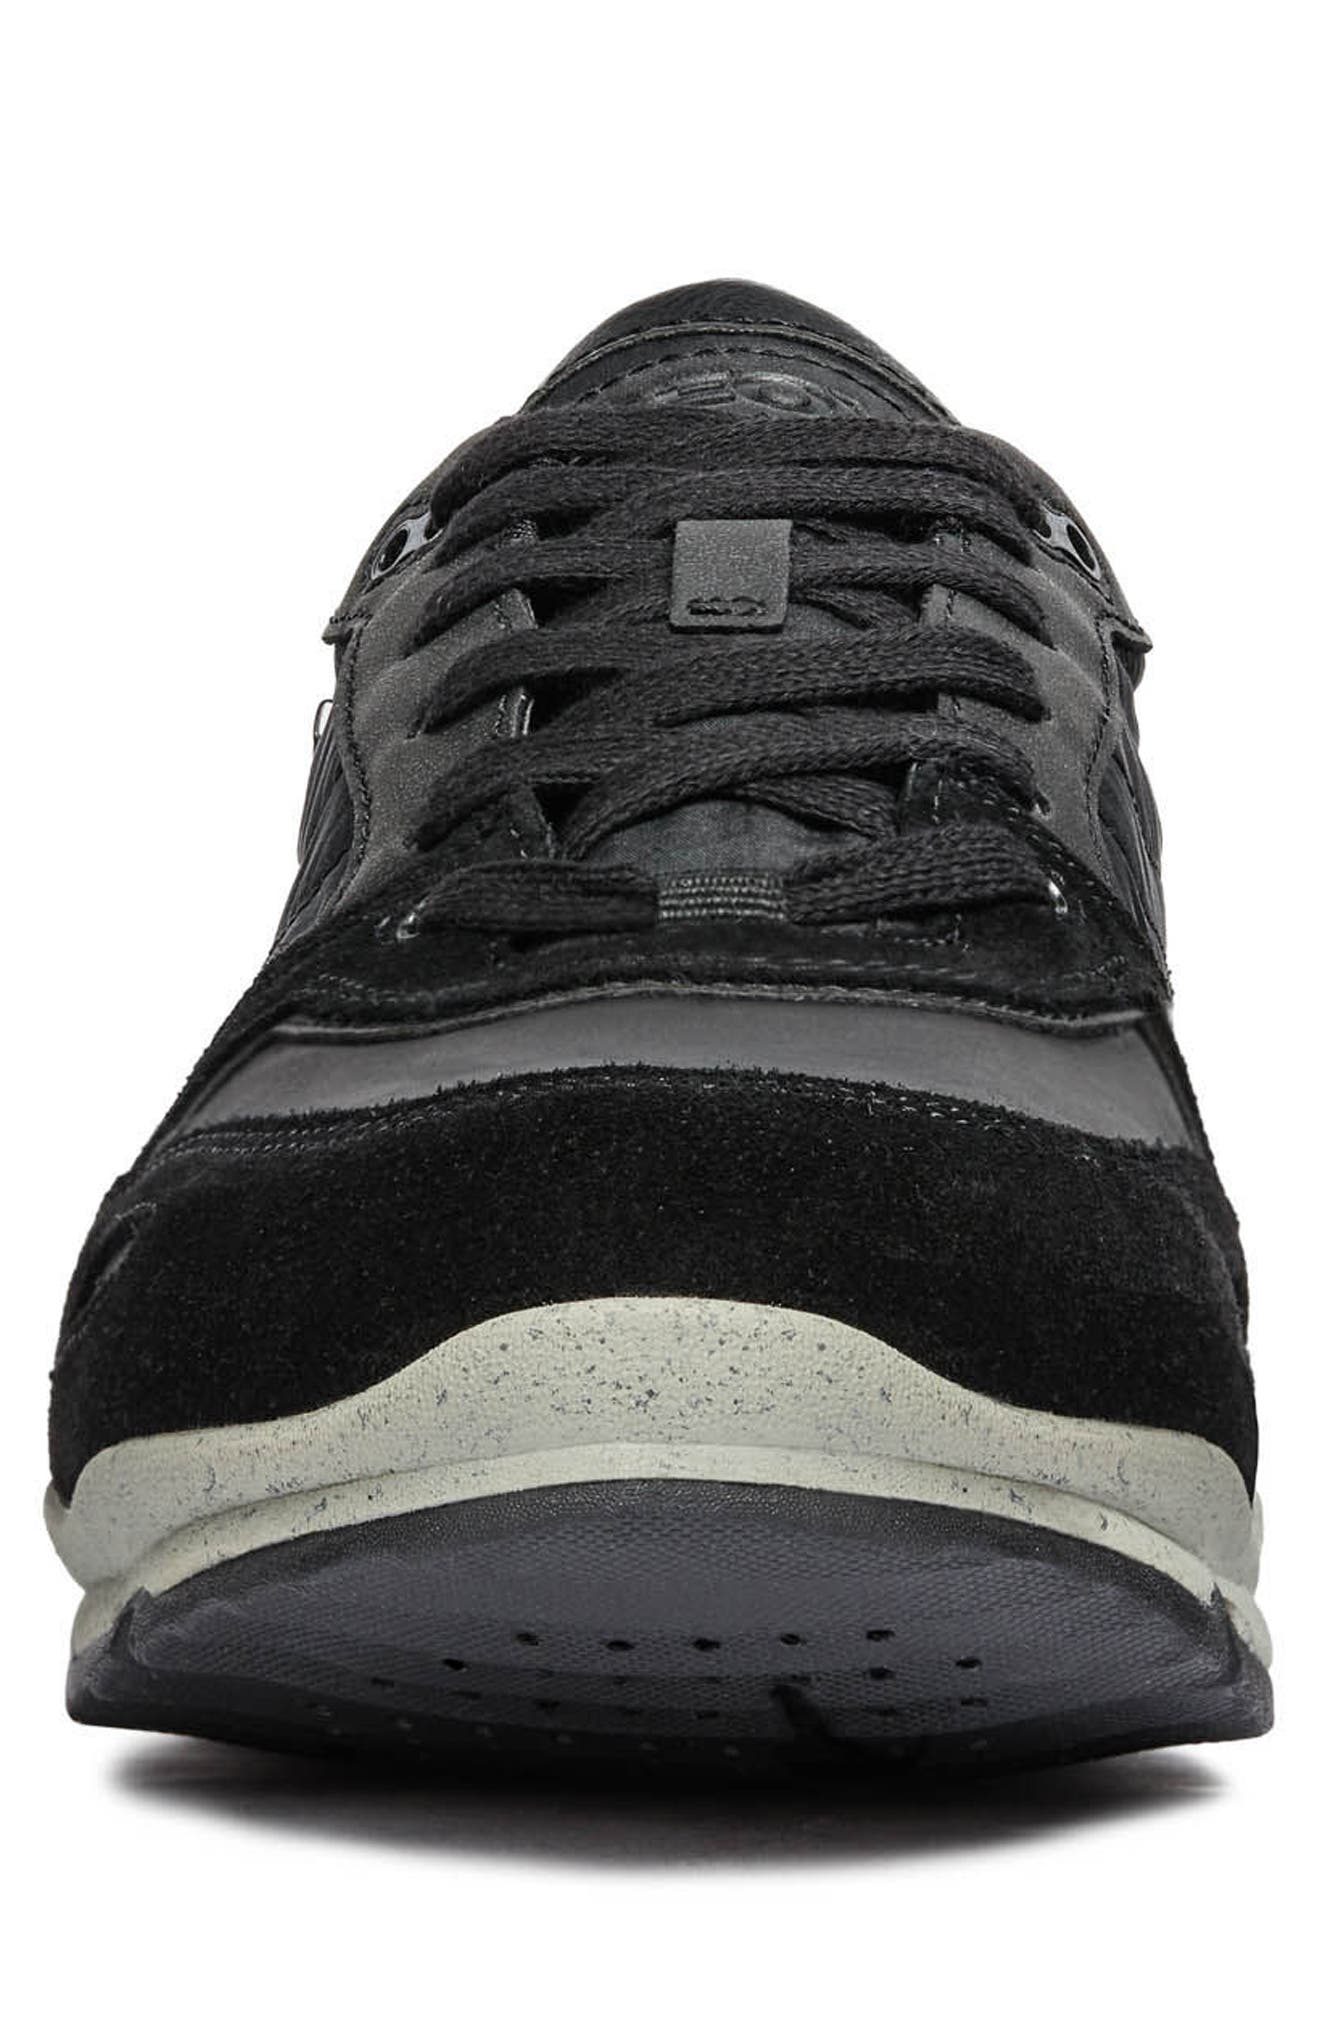 Sandro ABX Ambphibiox Waterproof Sneaker,                             Alternate thumbnail 4, color,                             007